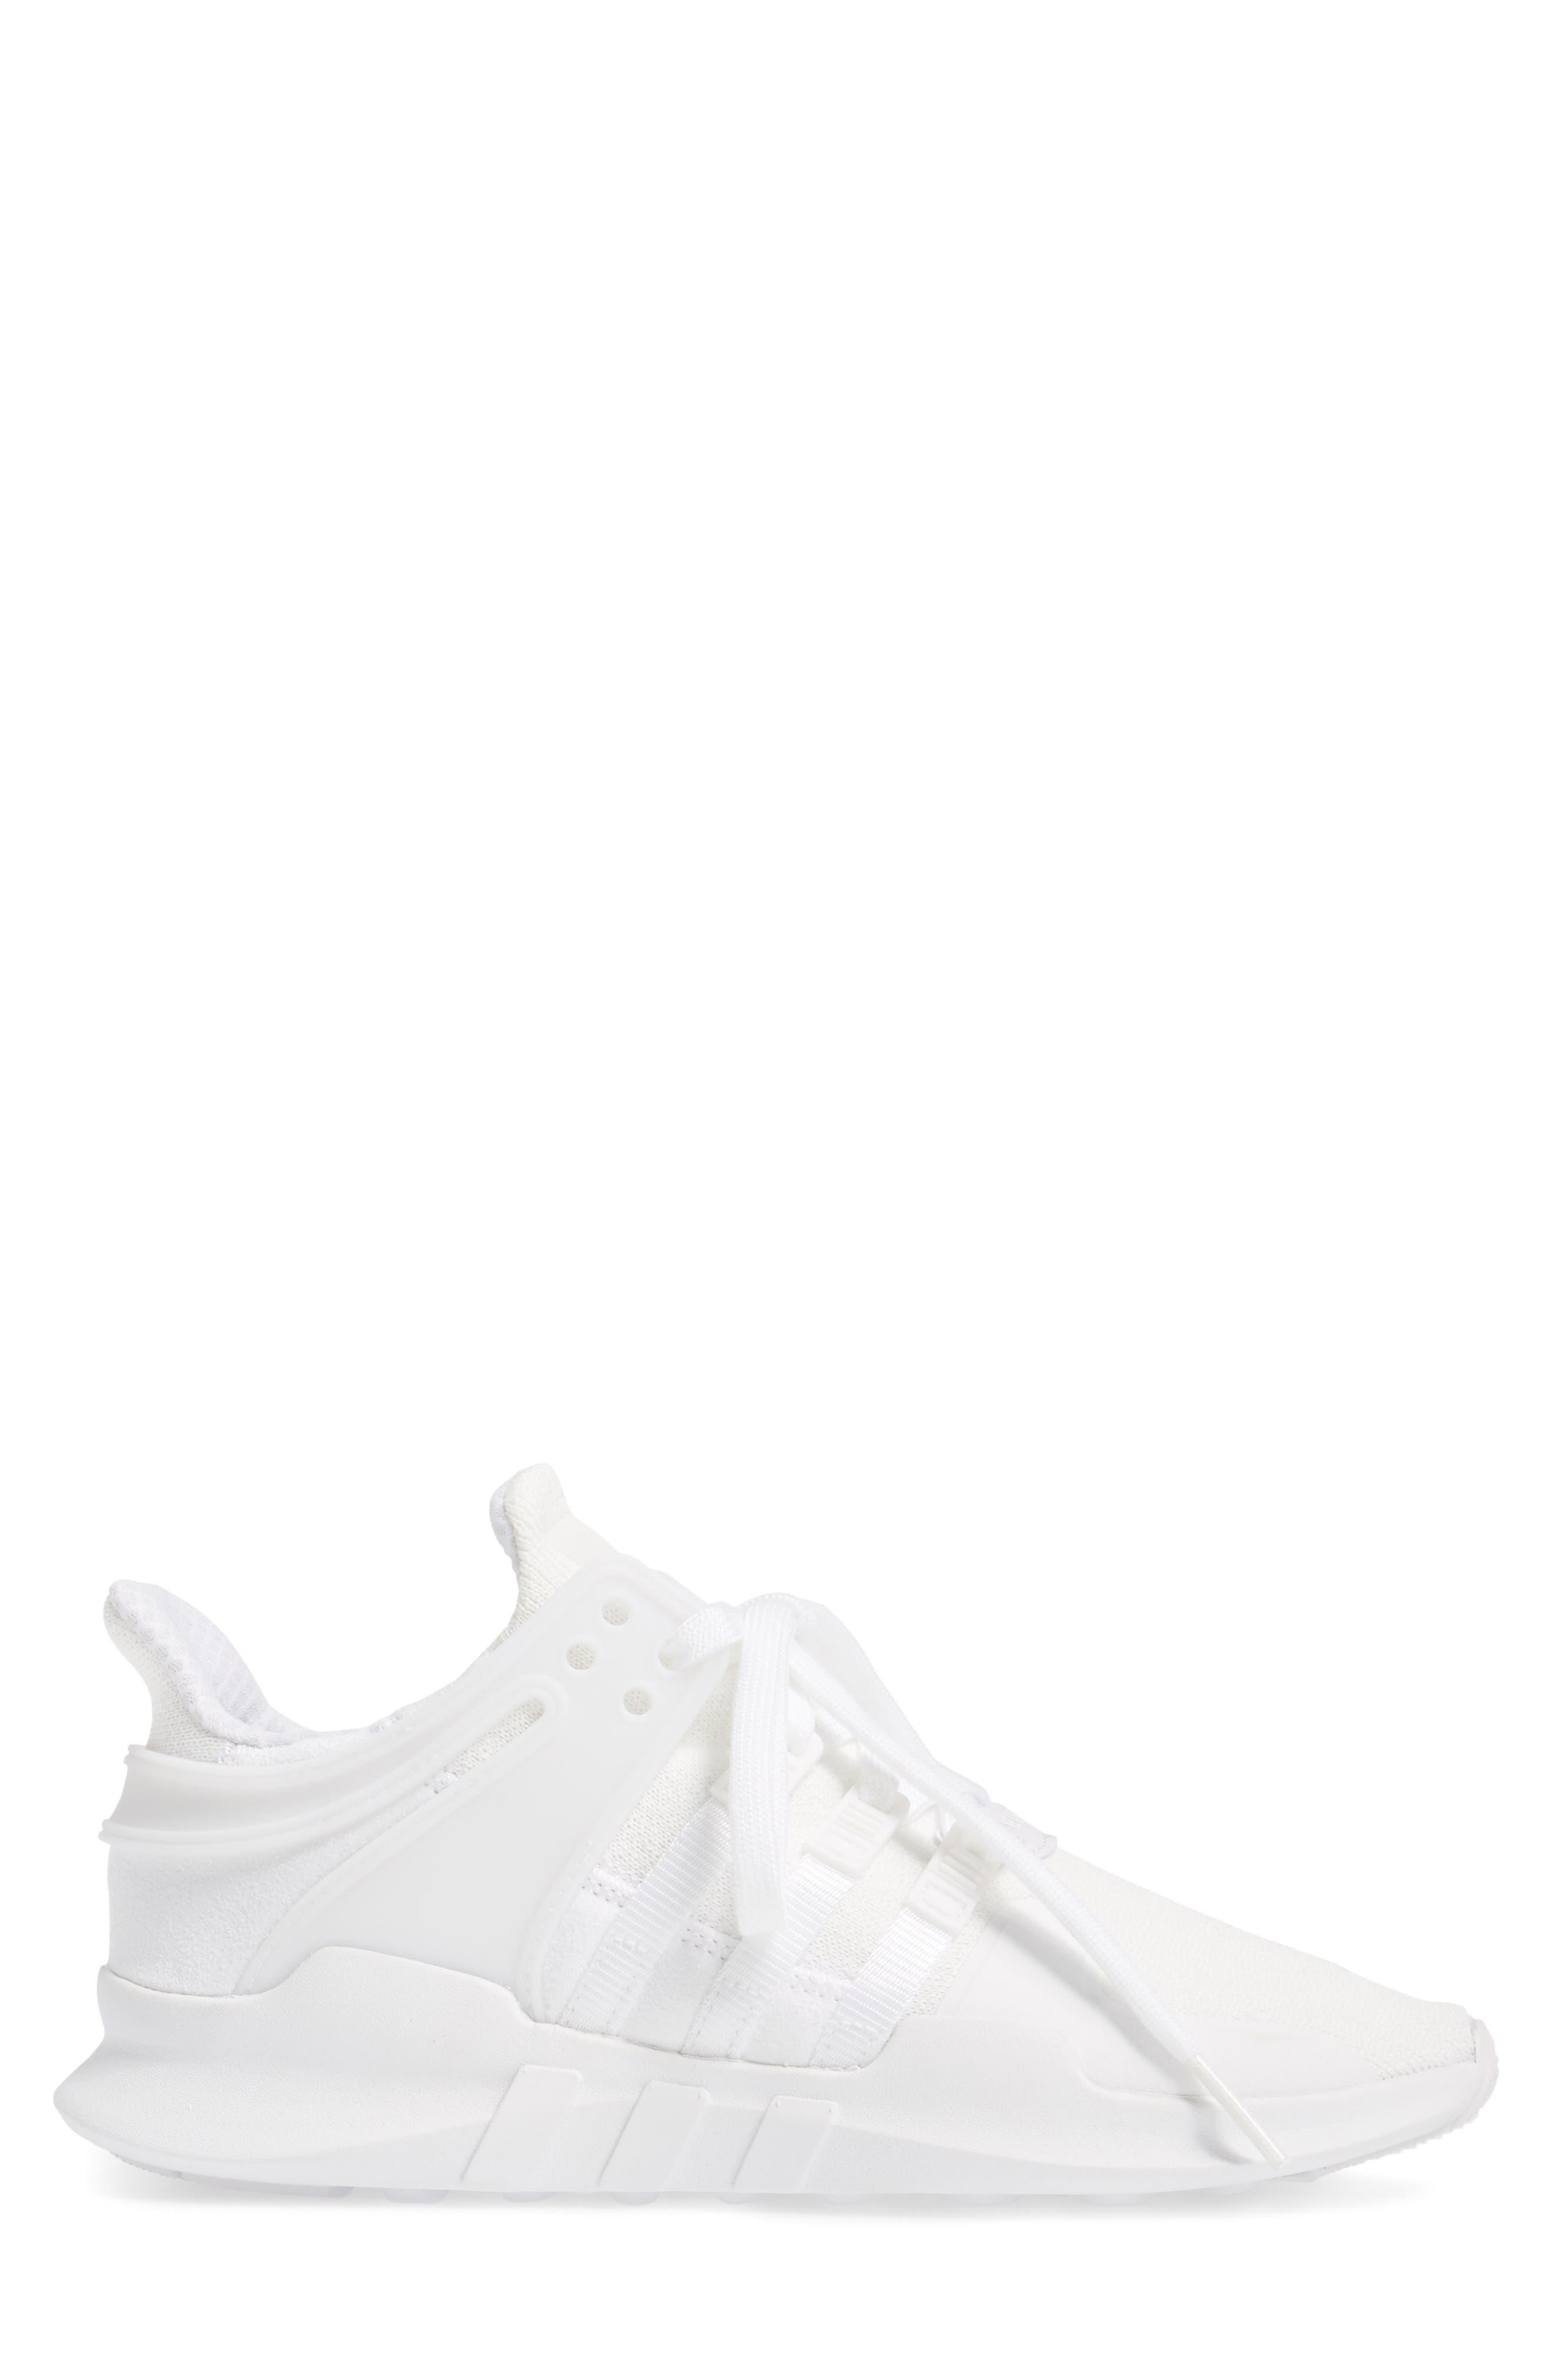 EQT Support Adv Sneaker,                             Alternate thumbnail 3, color,                             White/Core Black